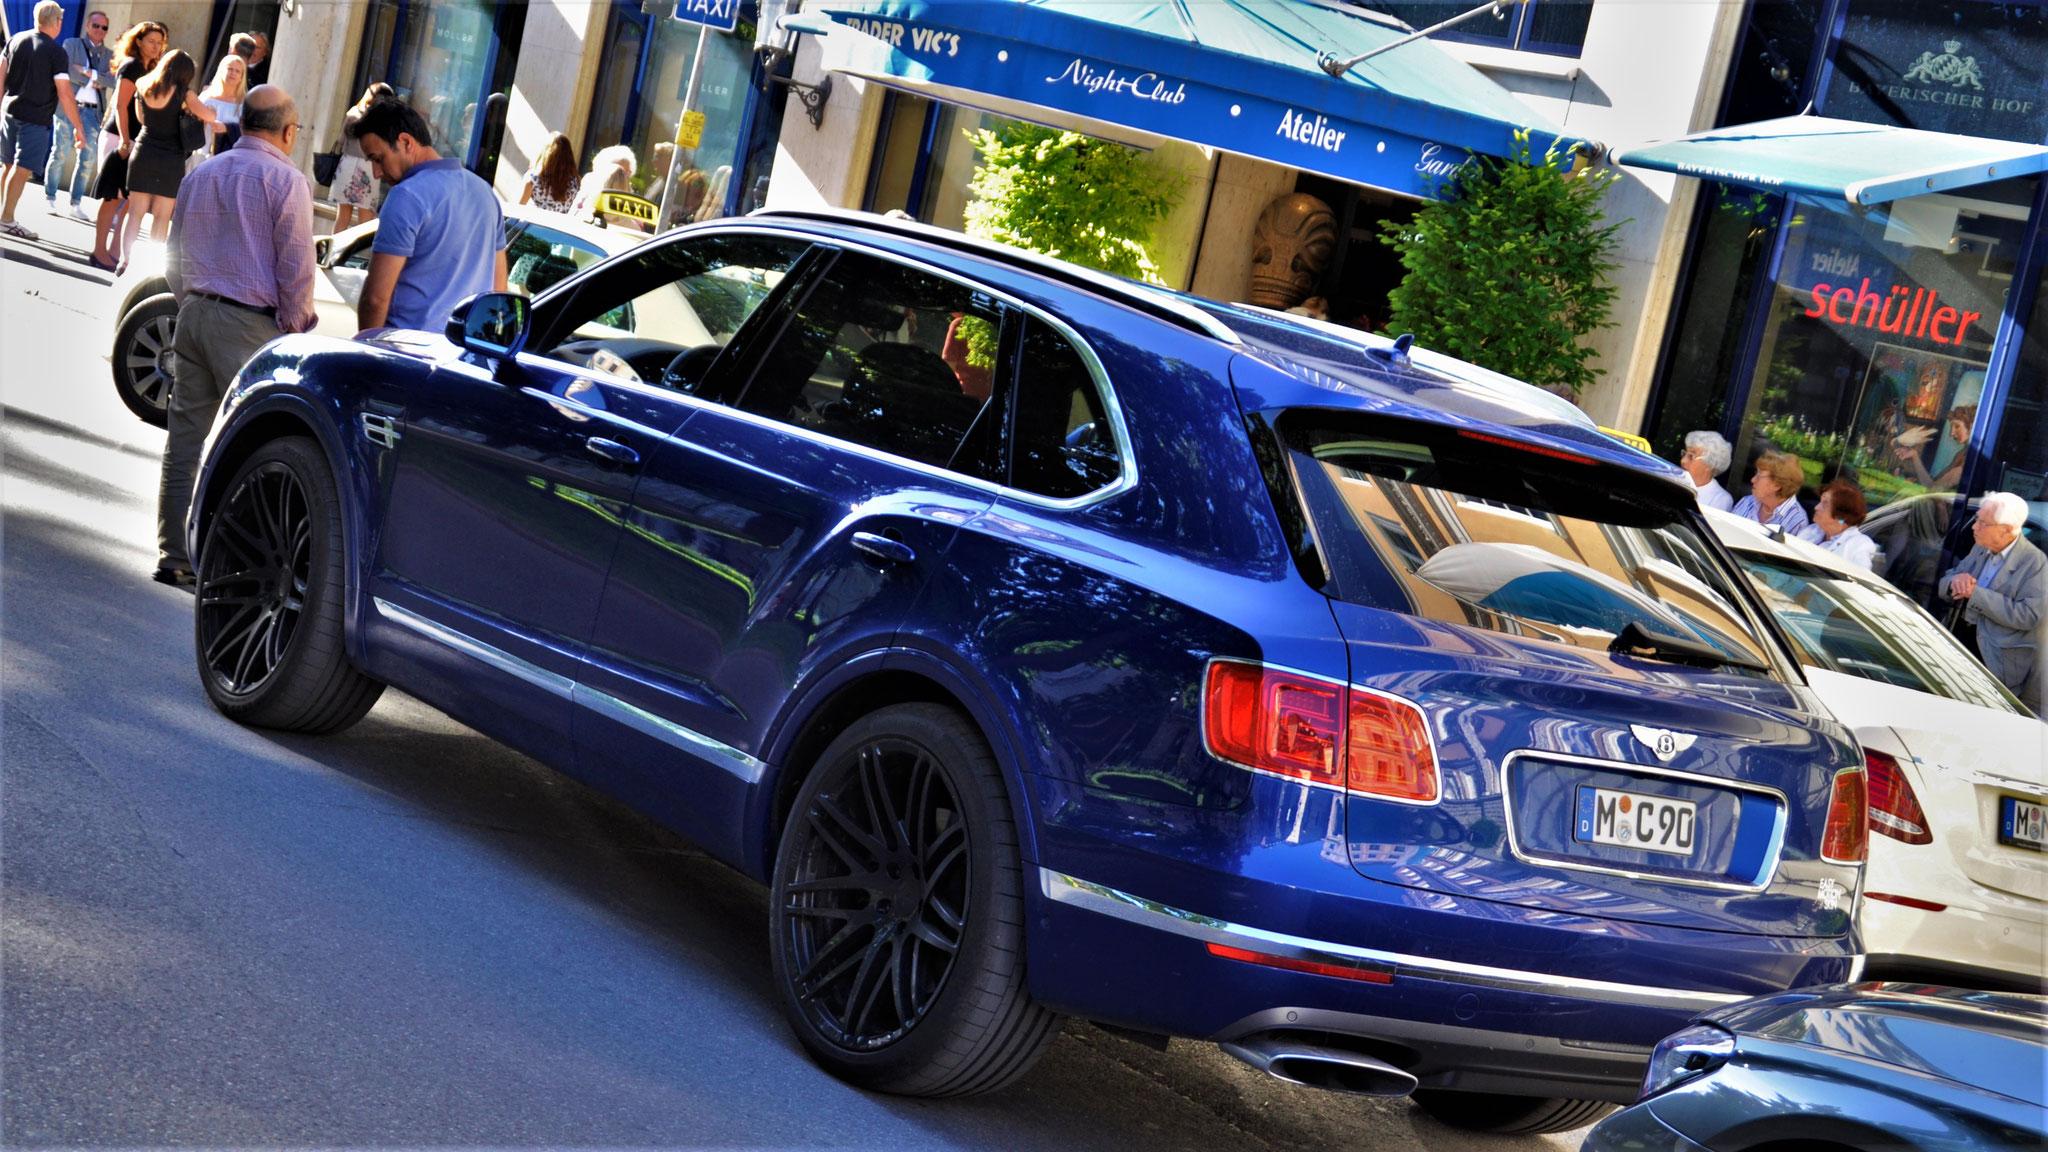 Bentley Bentayga - M-C-90